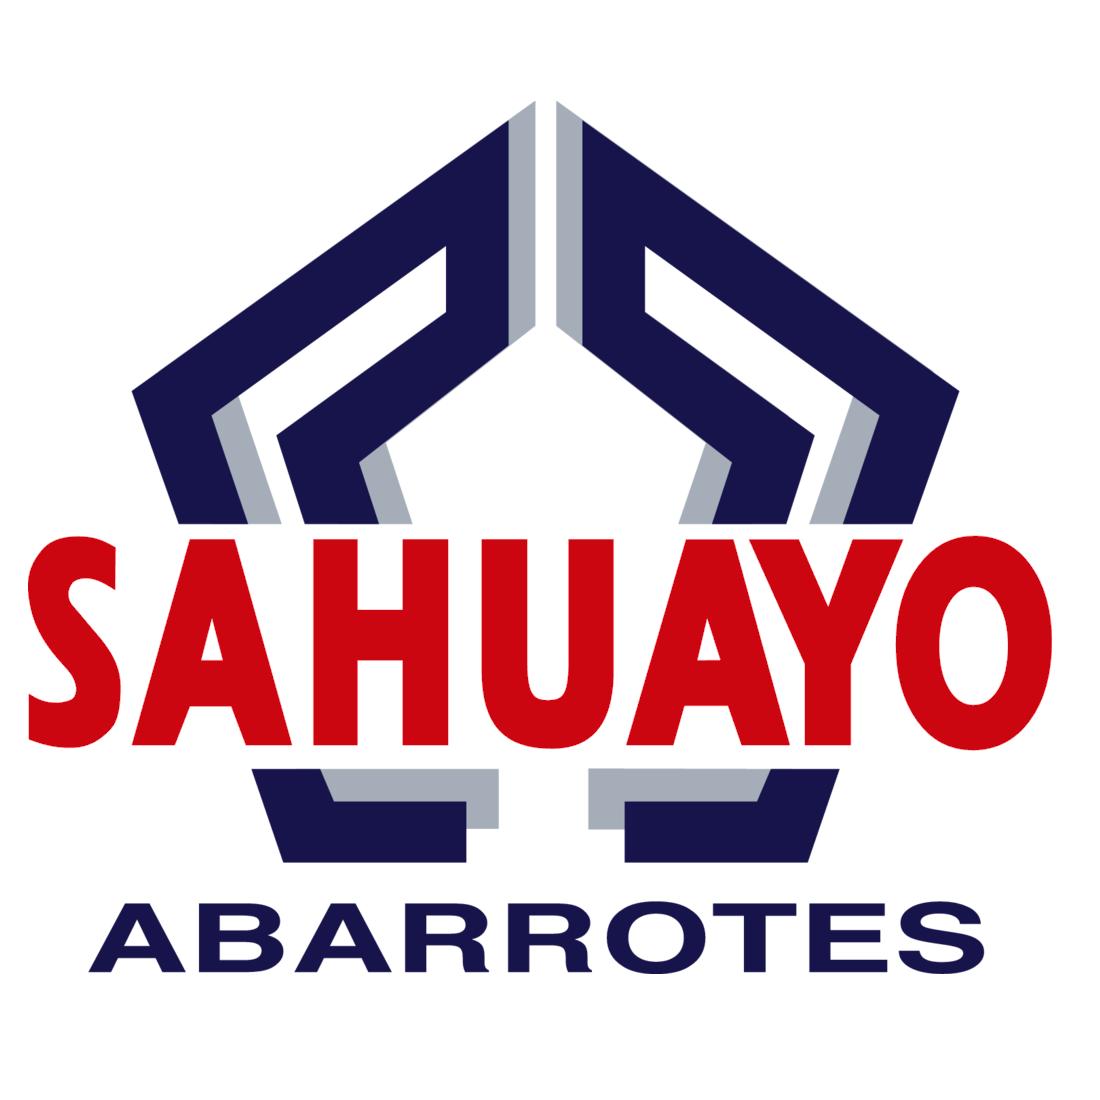 sahuayo � logos download